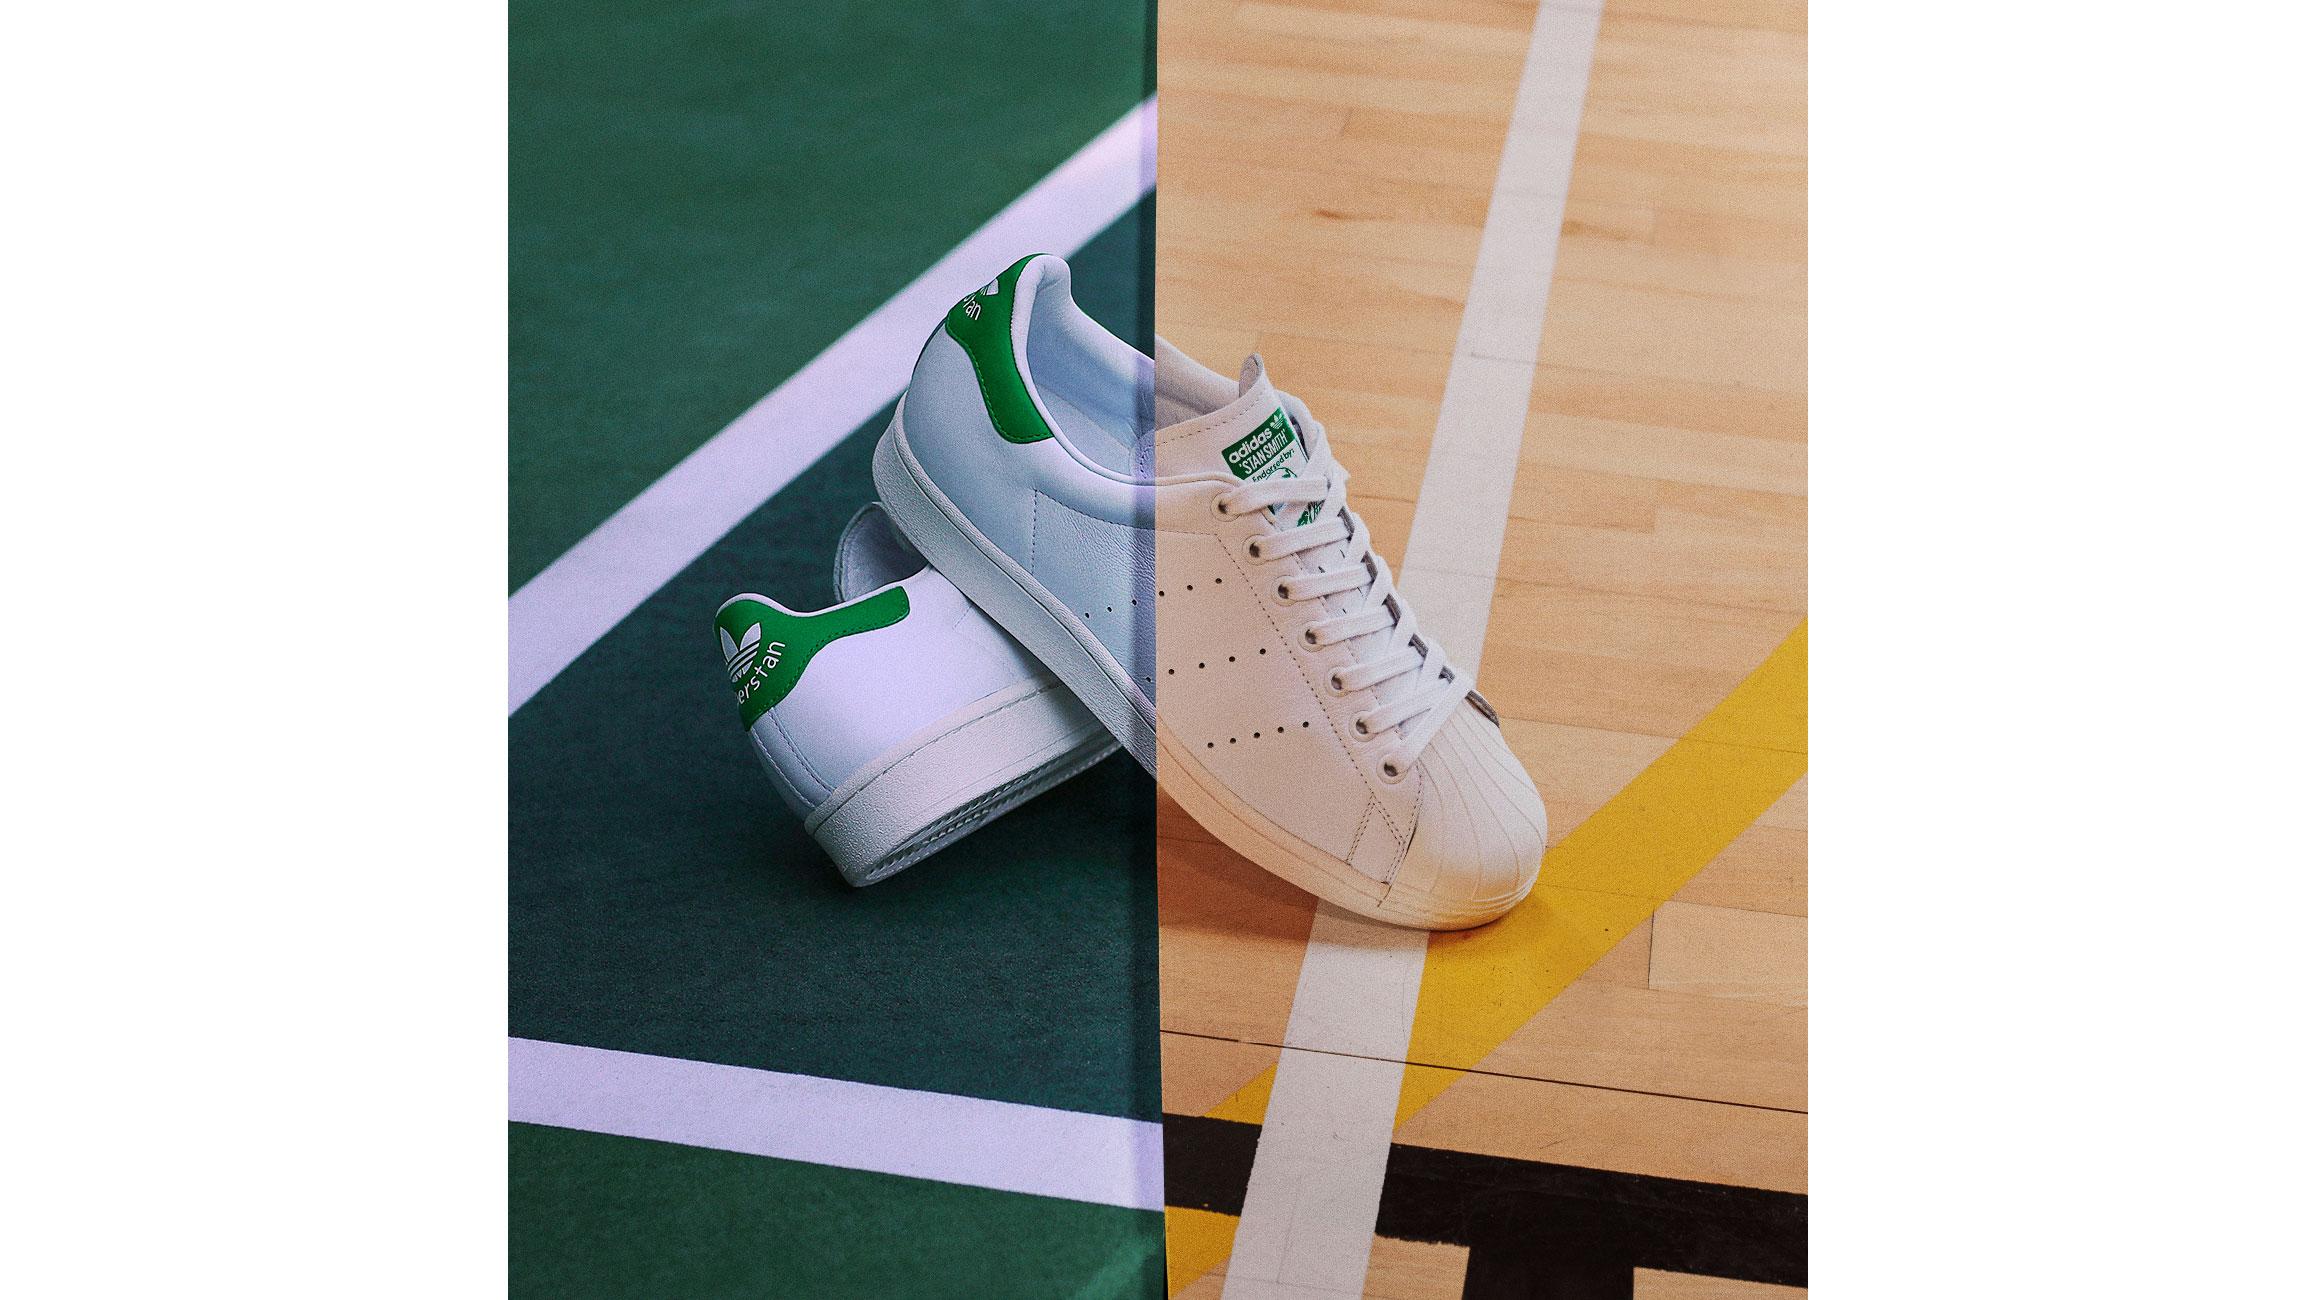 adidas Originals 推出新时代巨星 Superstan 鞋款